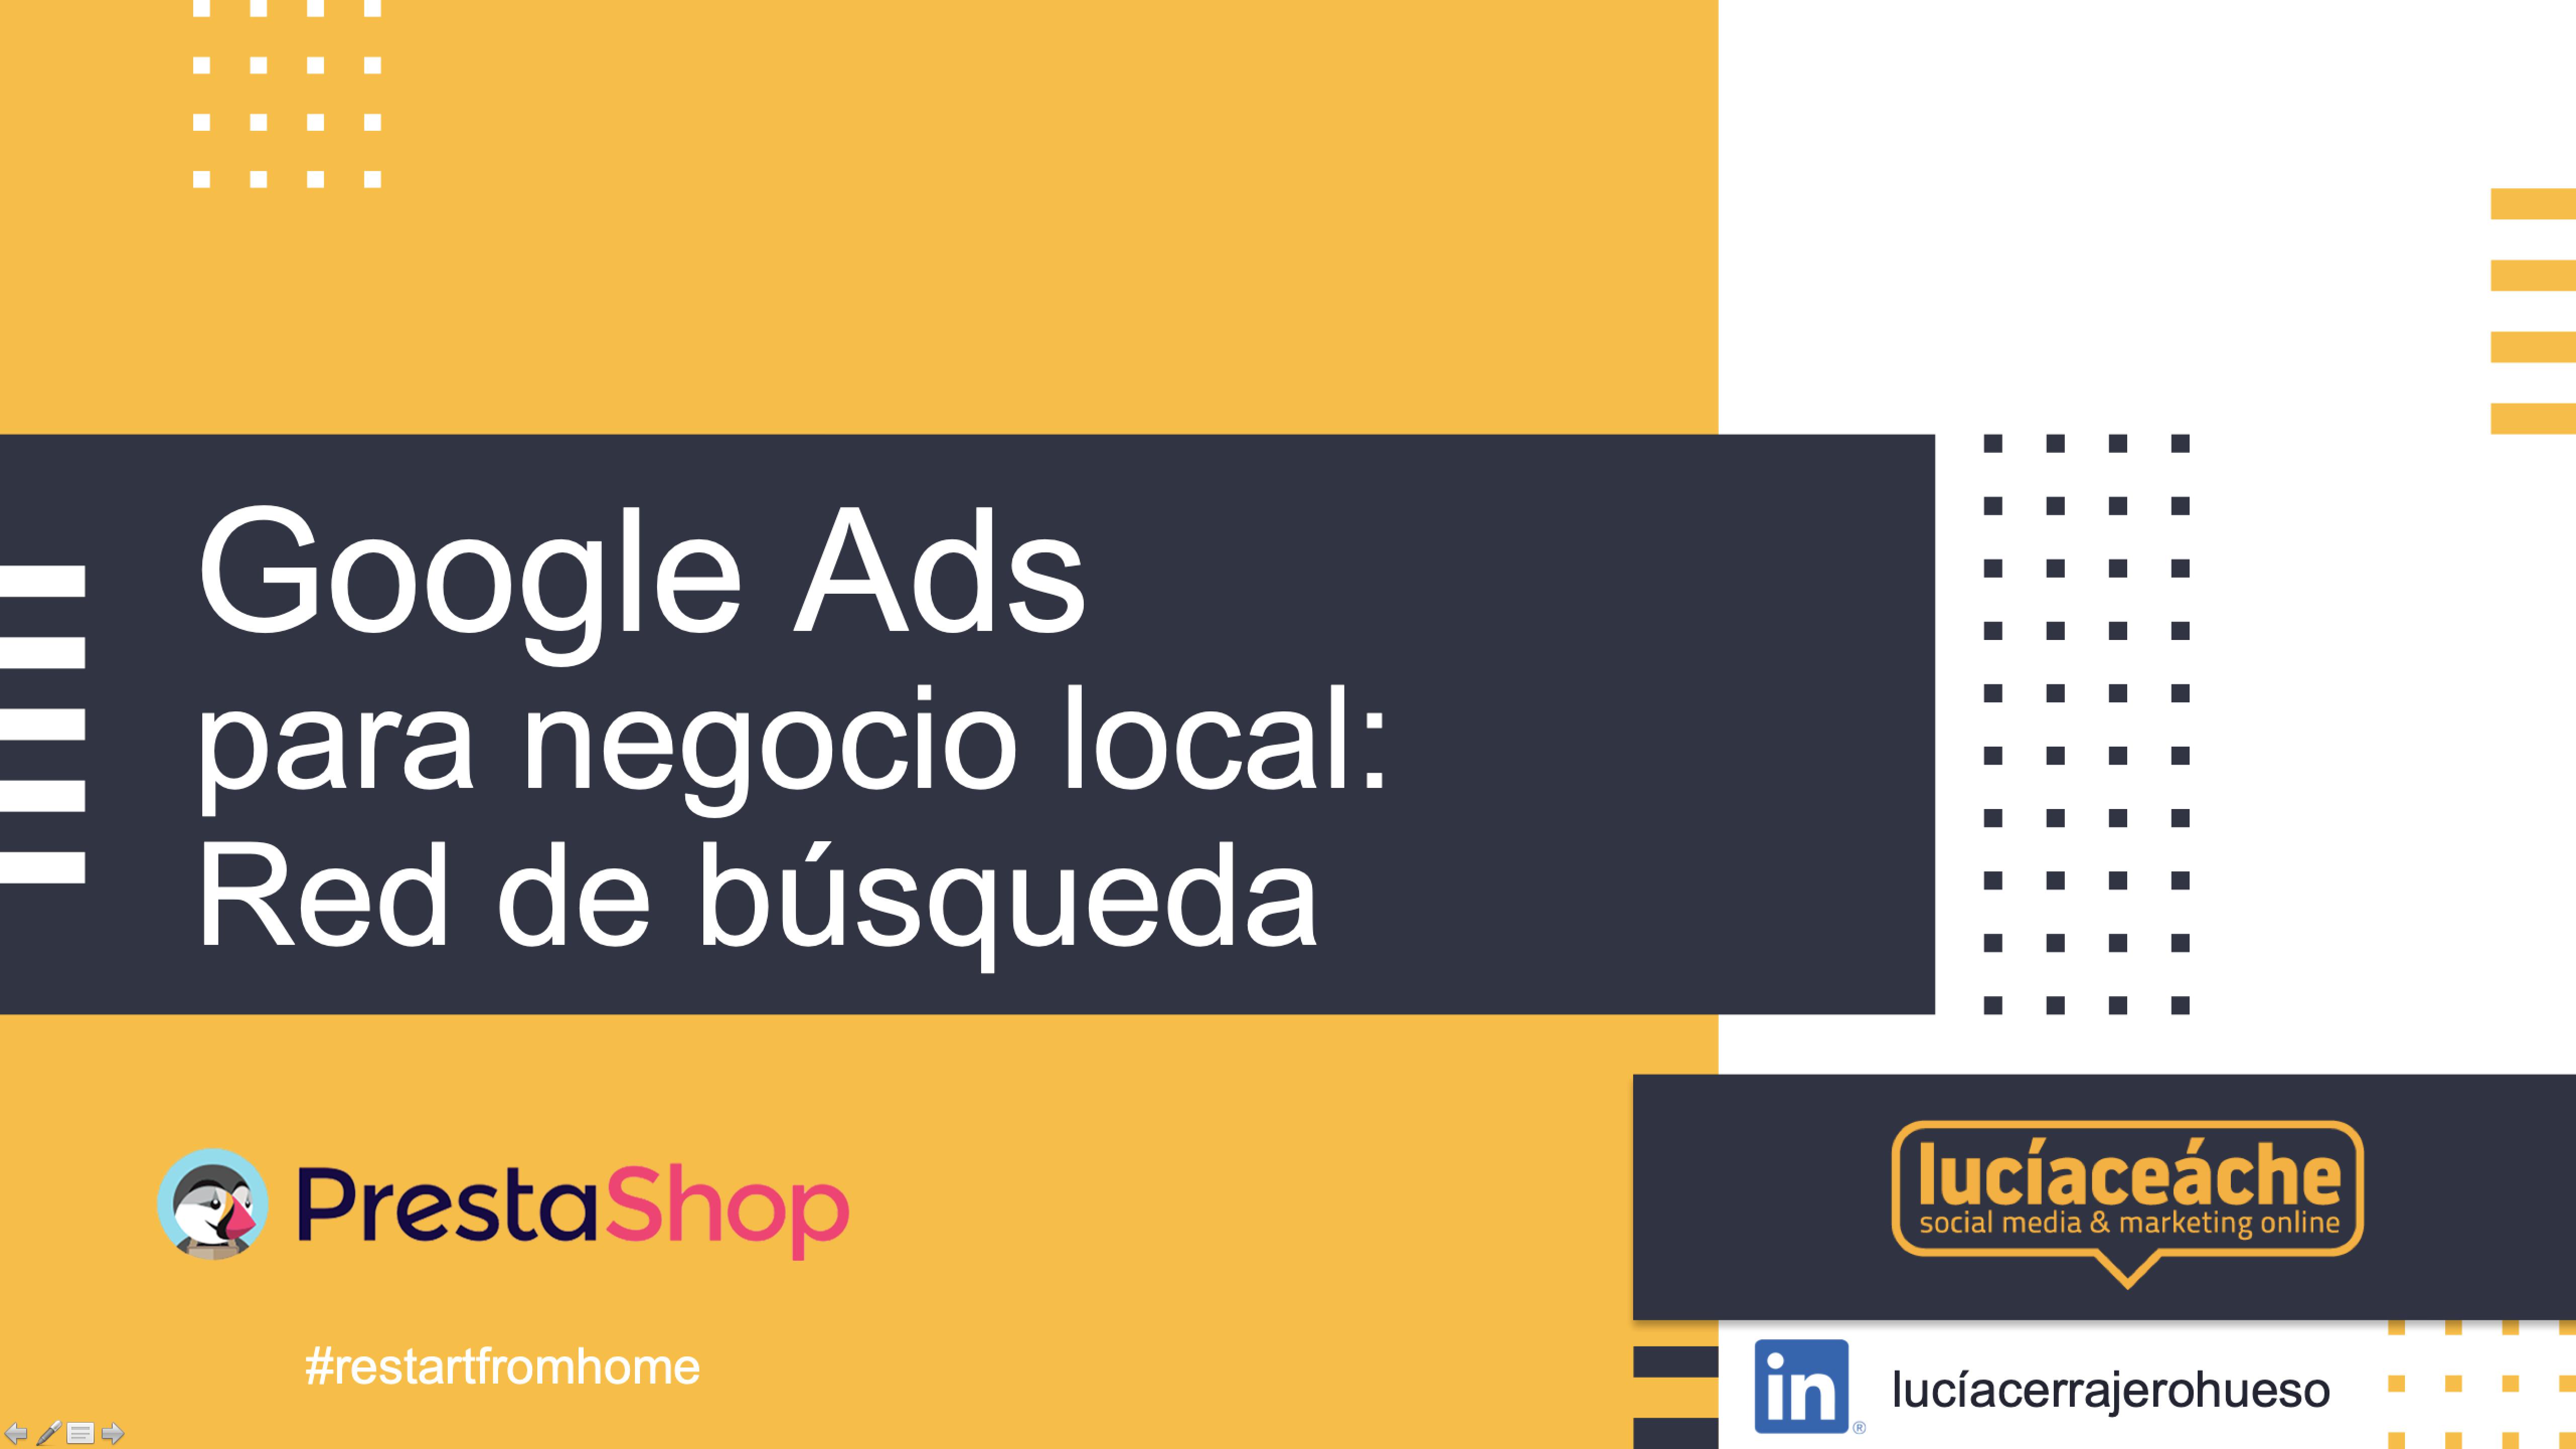 Google Ads negocio local